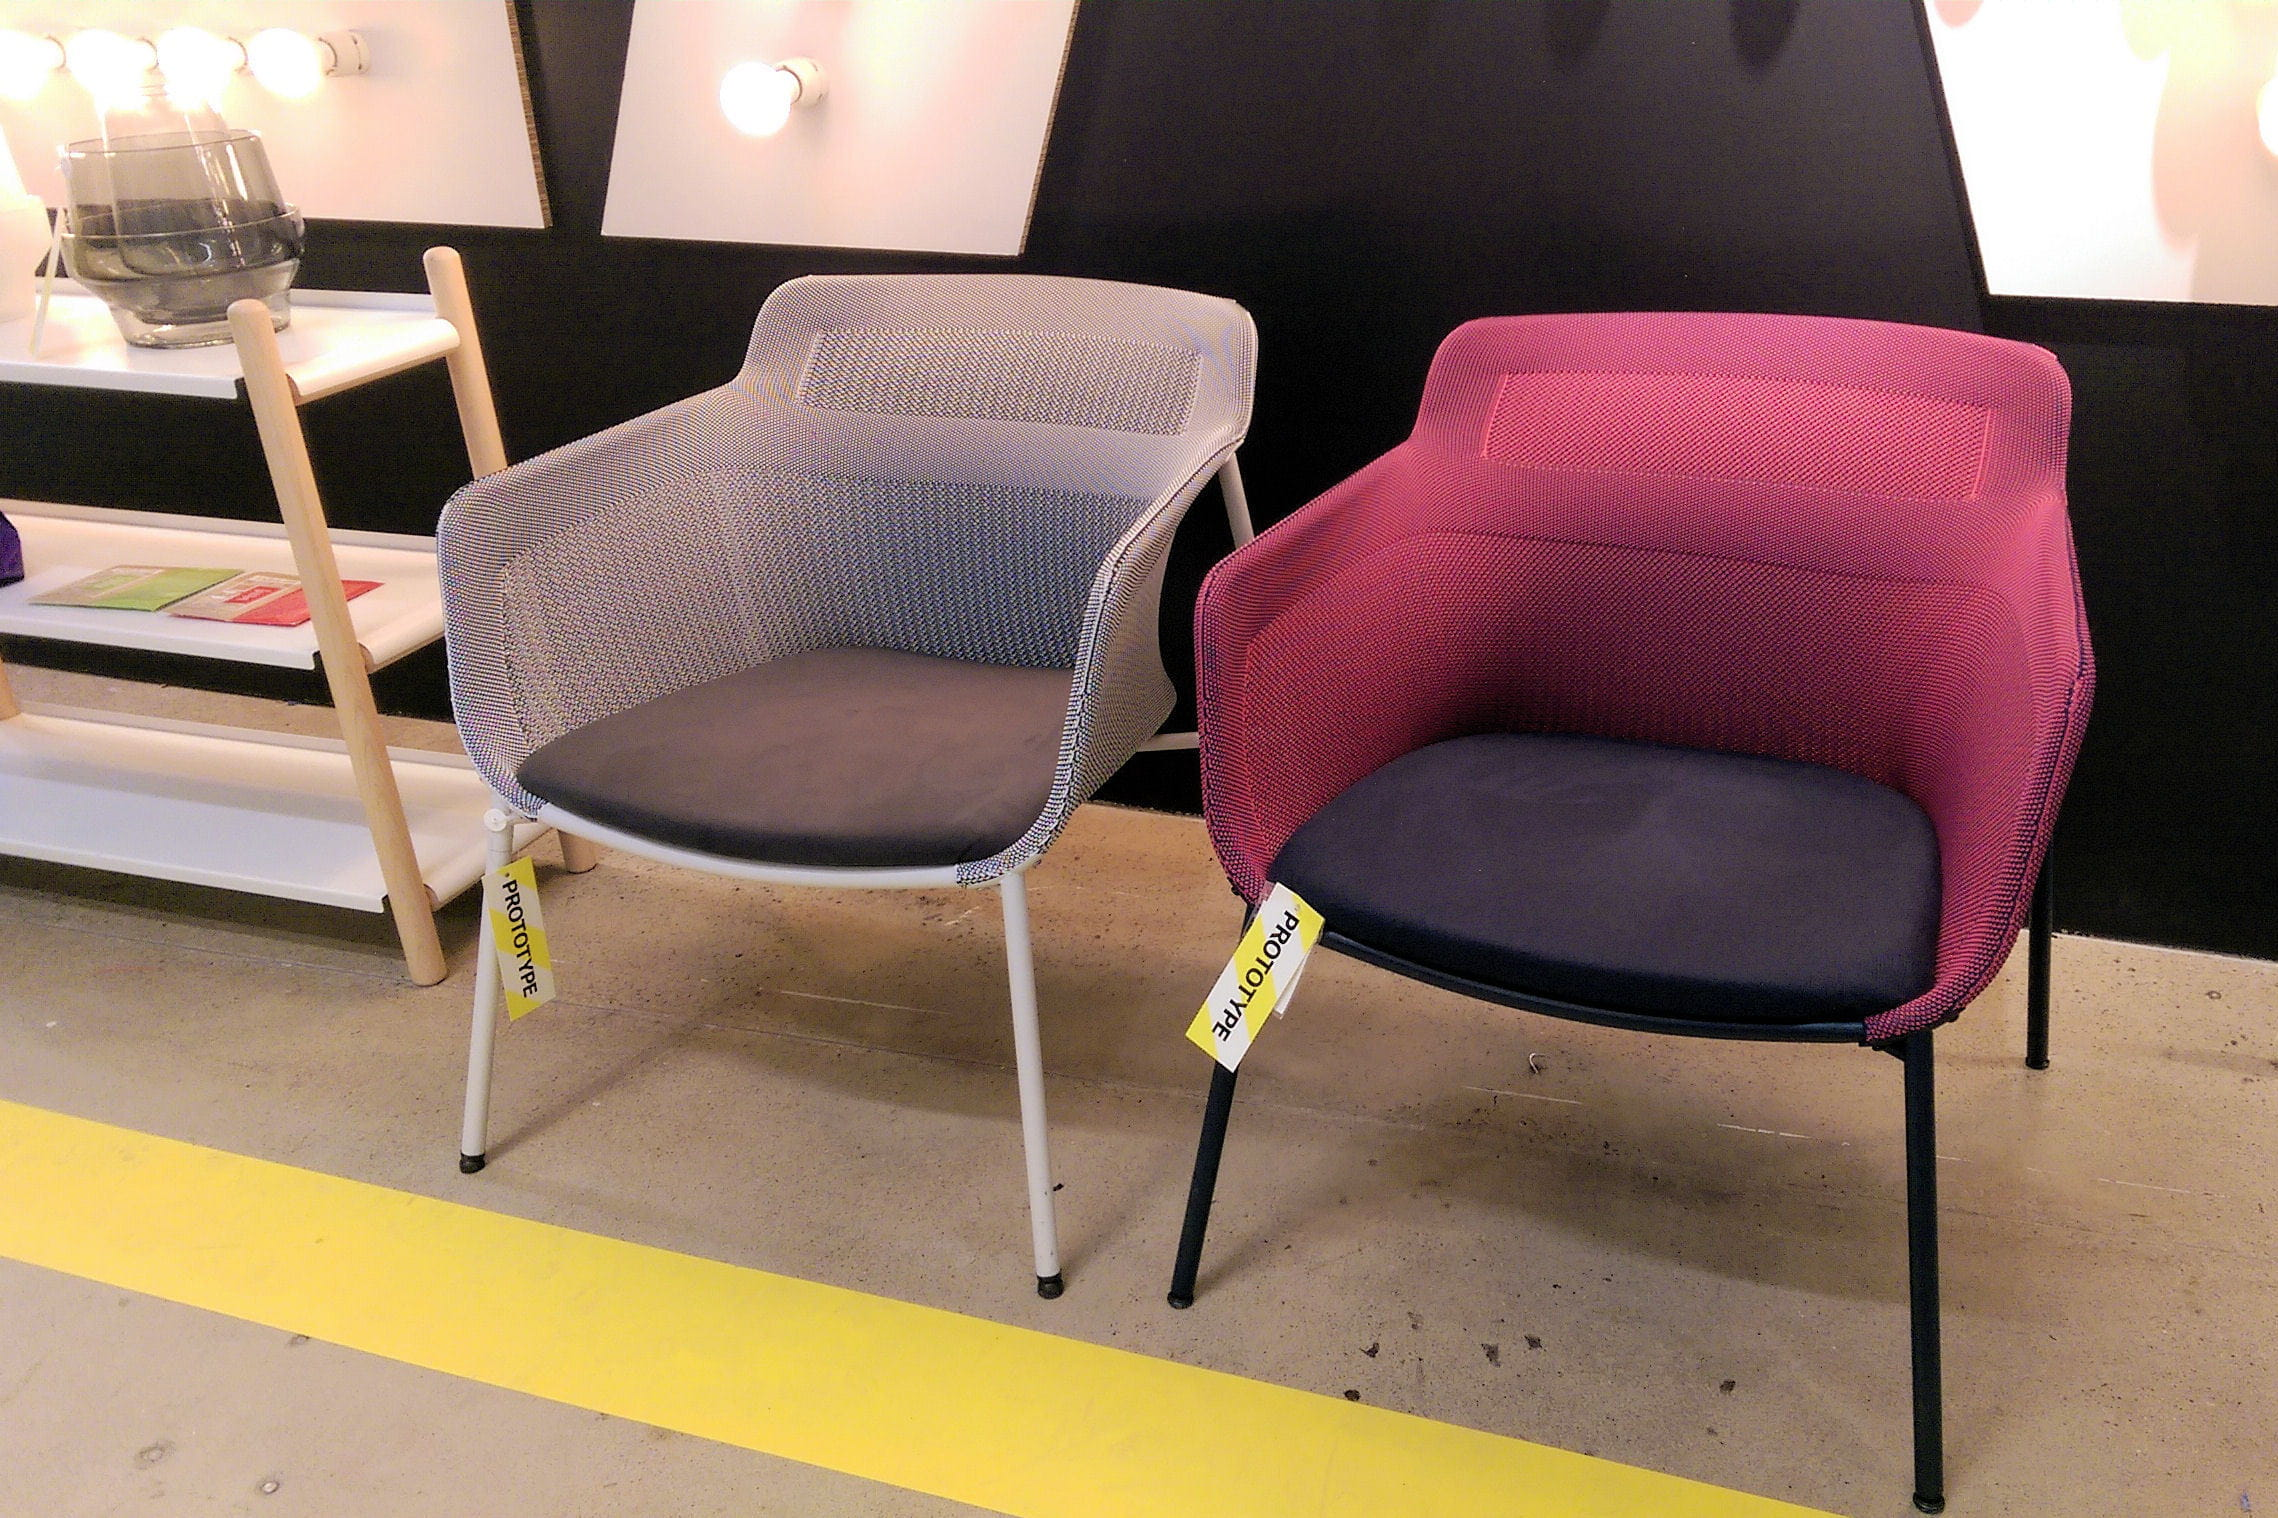 fauteuils ikea ps 2017 en tissage 3d. Black Bedroom Furniture Sets. Home Design Ideas